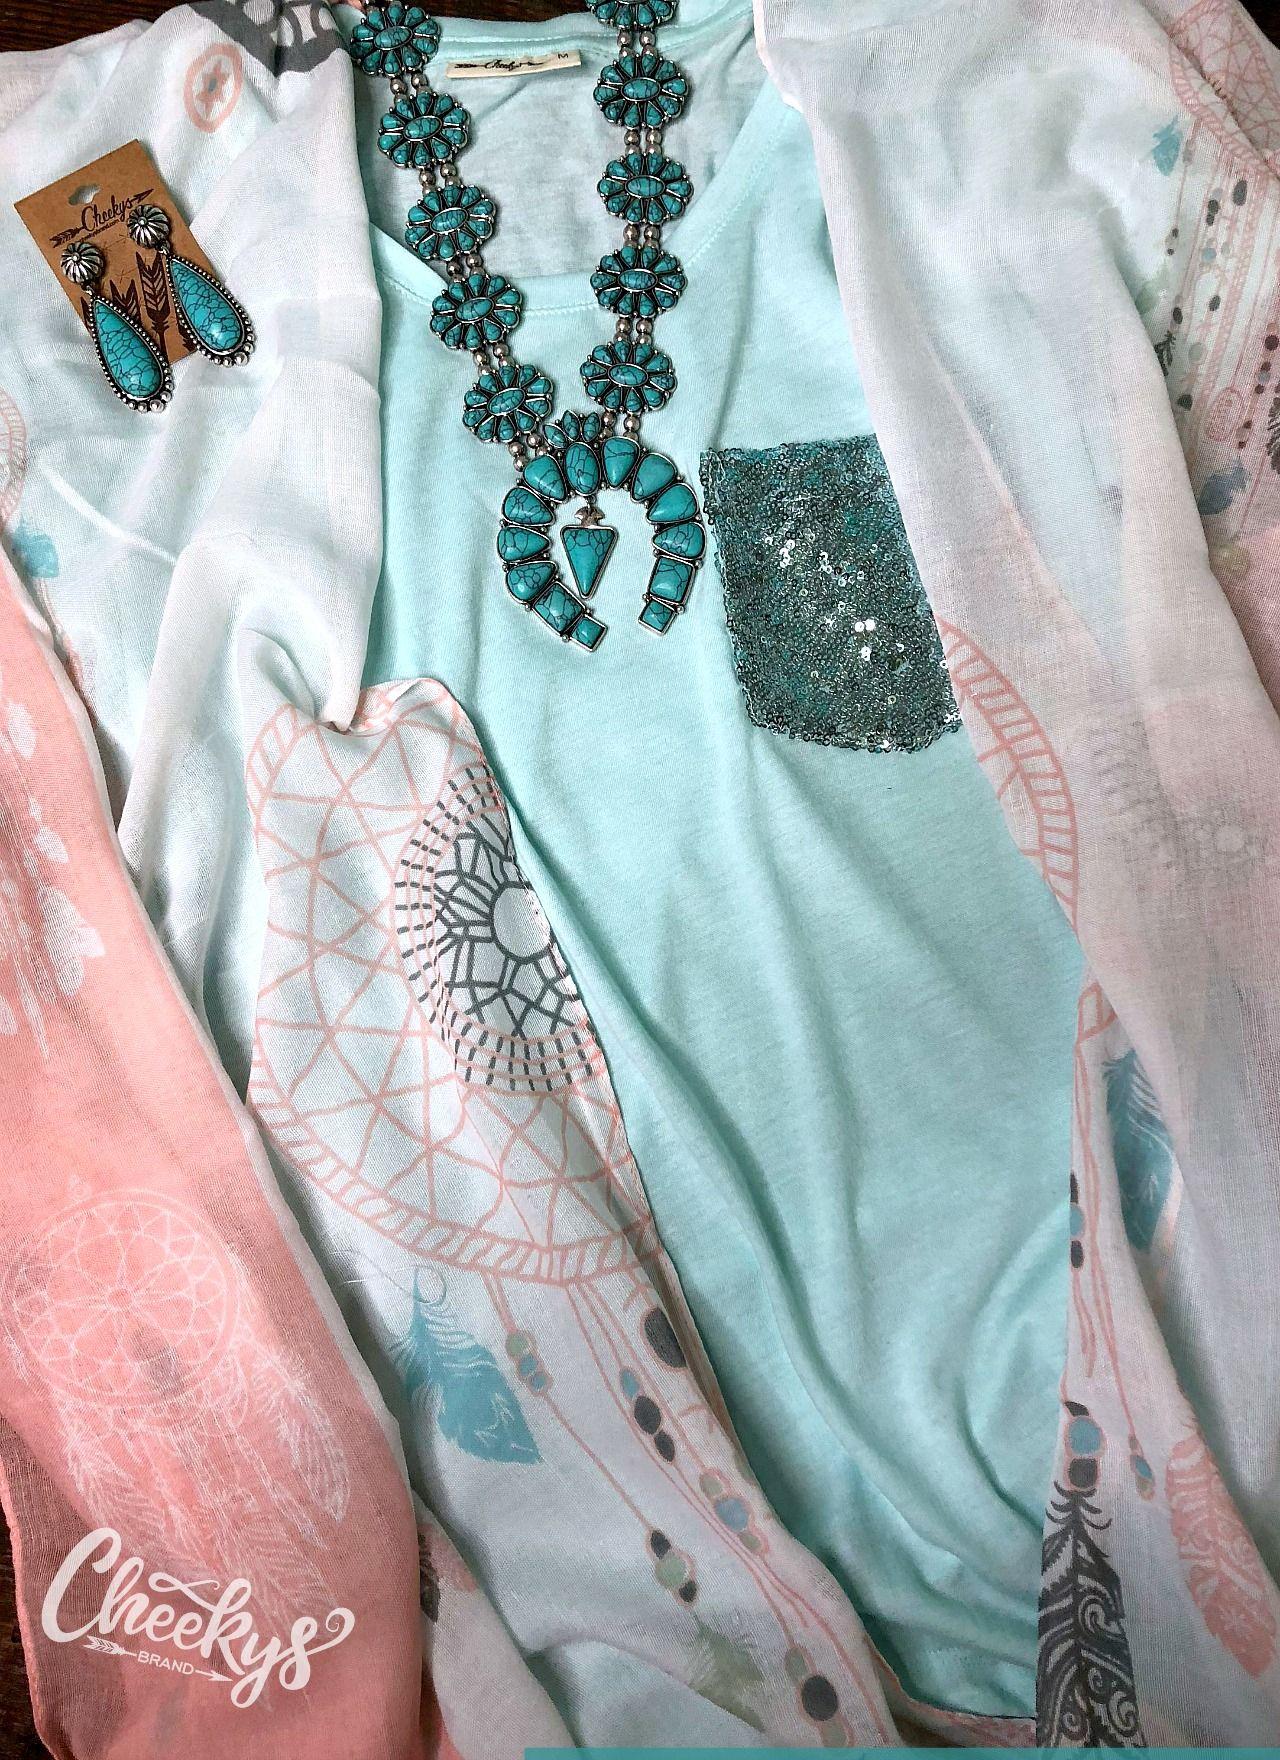 6132b2bcec69 Tiffany Blue sequin scoop tee.  sequin  teeshirt  bling  squashblossom   turquoise  countrygirl  womenswear  womensfashion